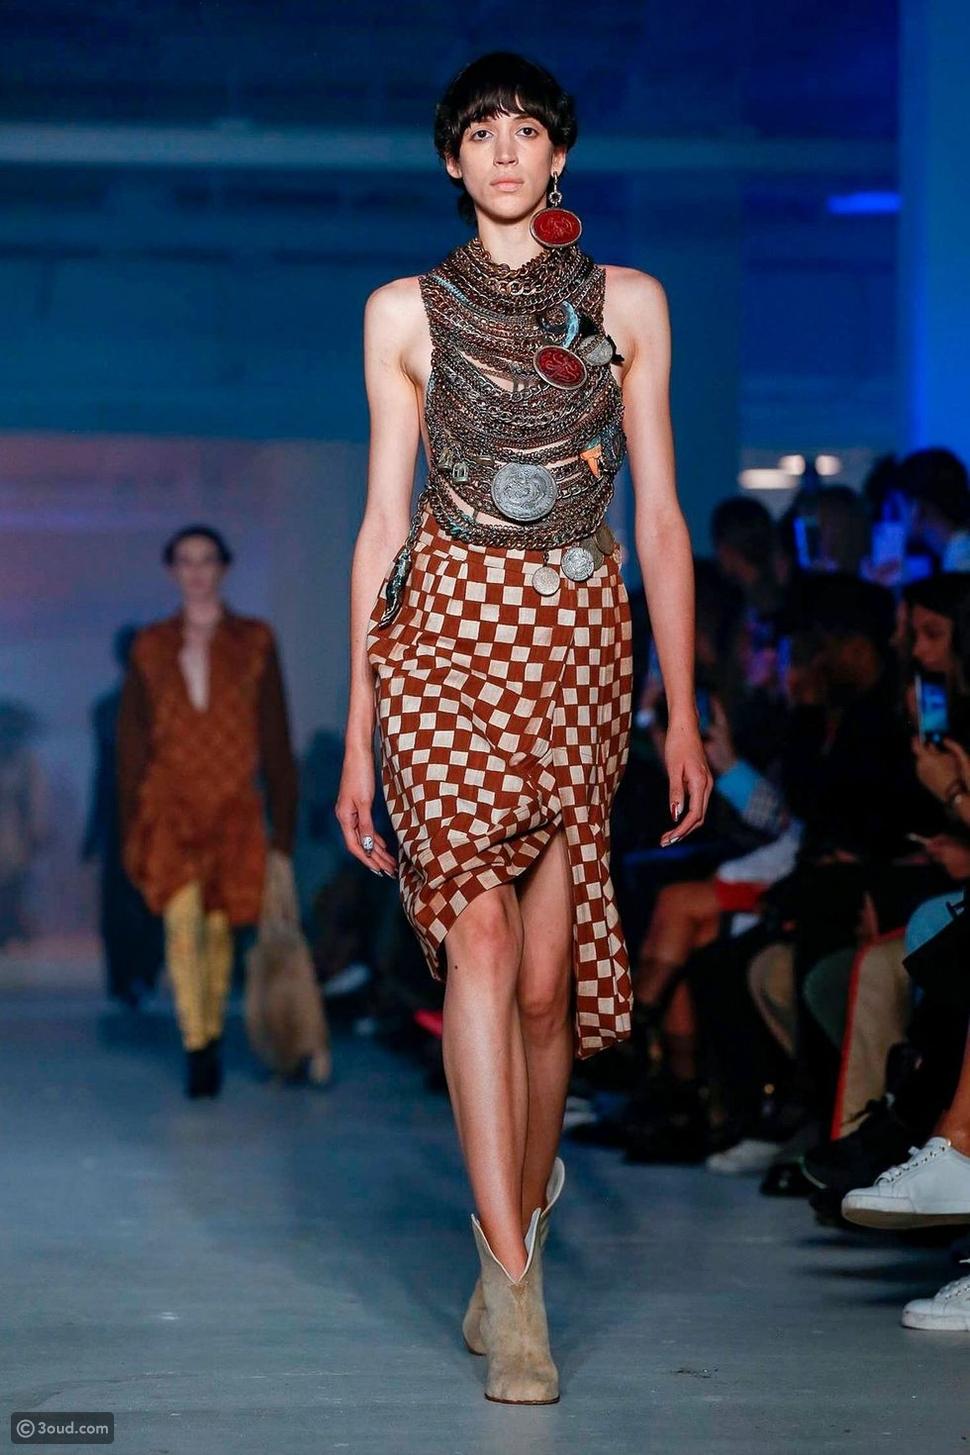 عرض أزياء Vivienne Westwood لربيع وصيف 2020